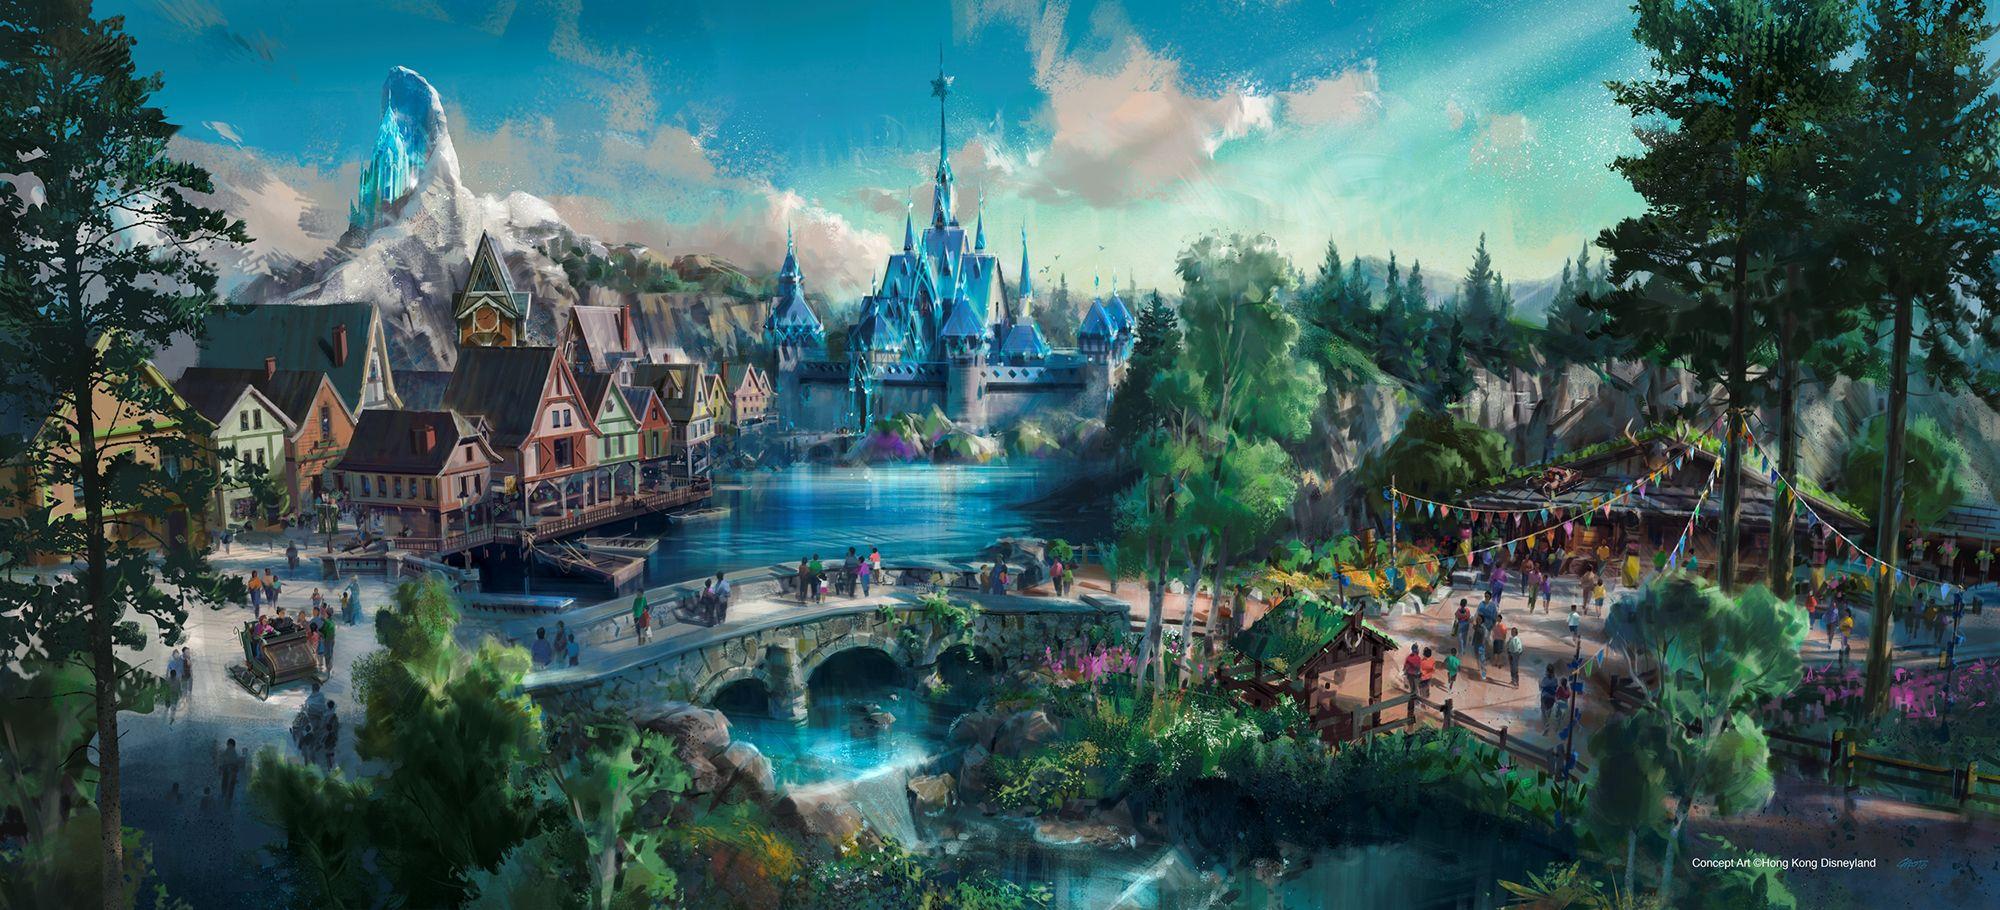 Hong Kong Disneyland Frozen zone